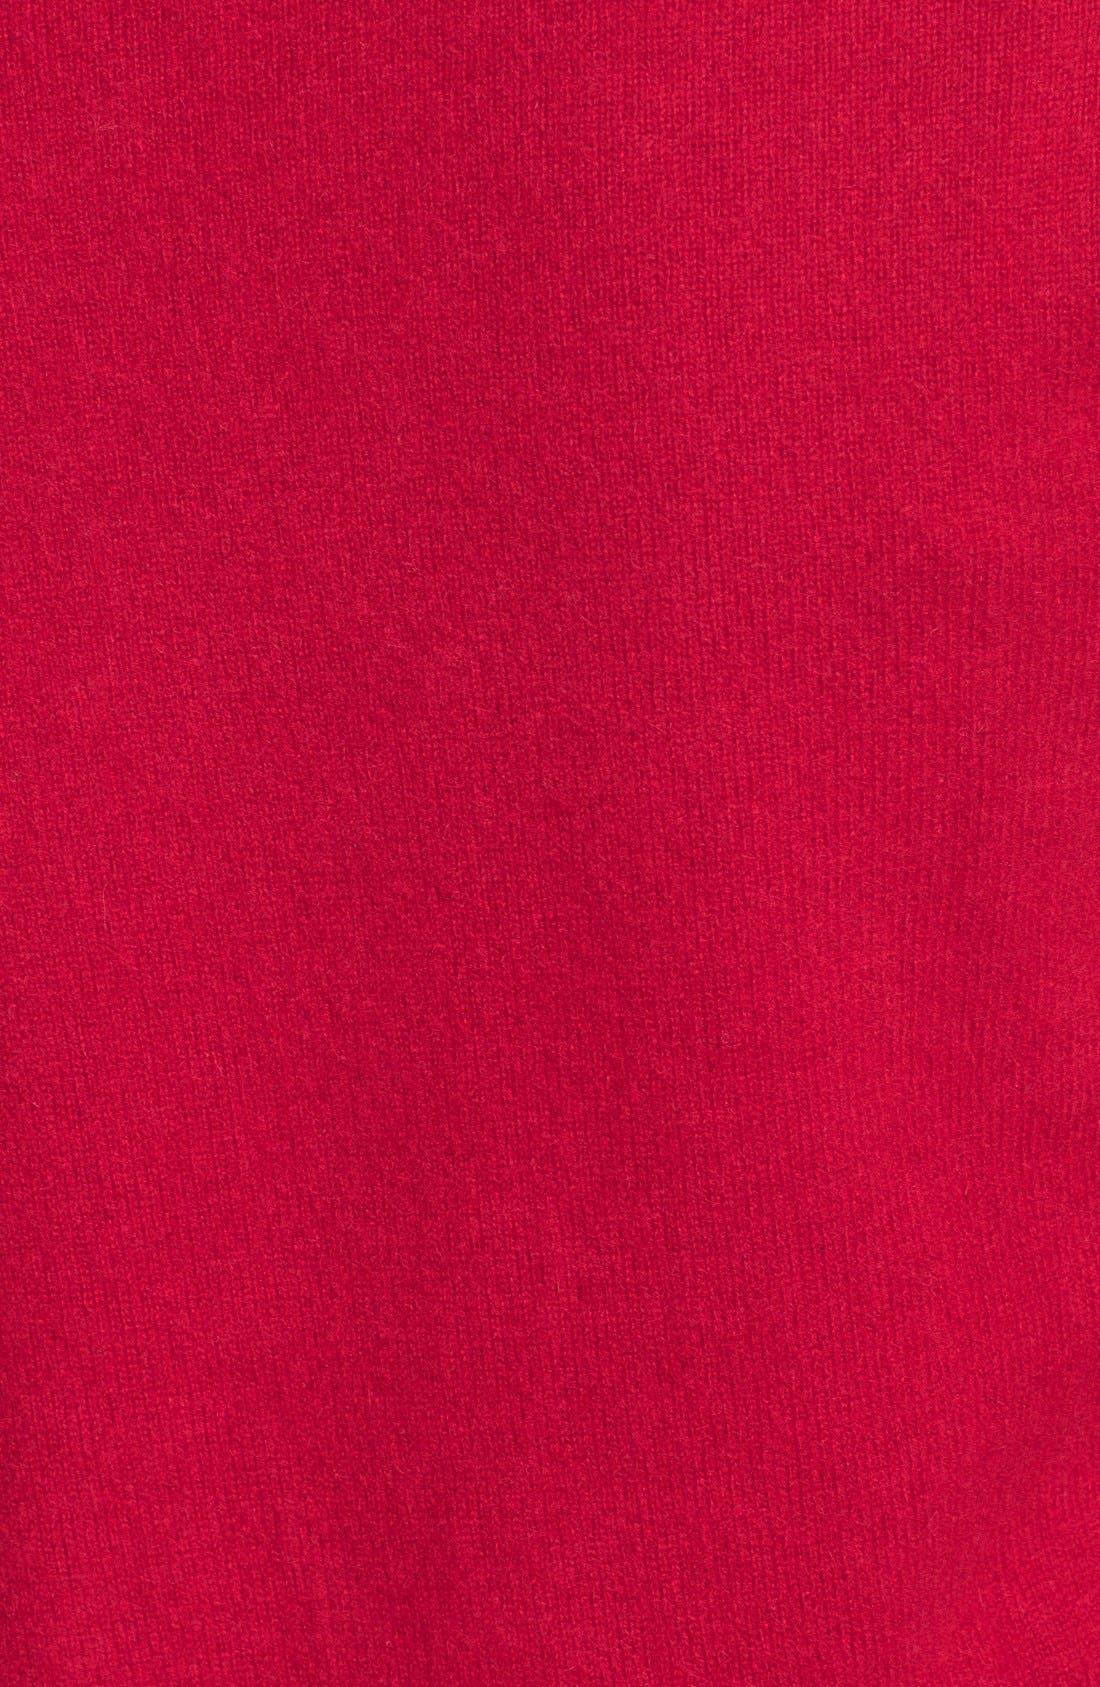 ,                             Cashmere V-Neck Sweater,                             Alternate thumbnail 70, color,                             610